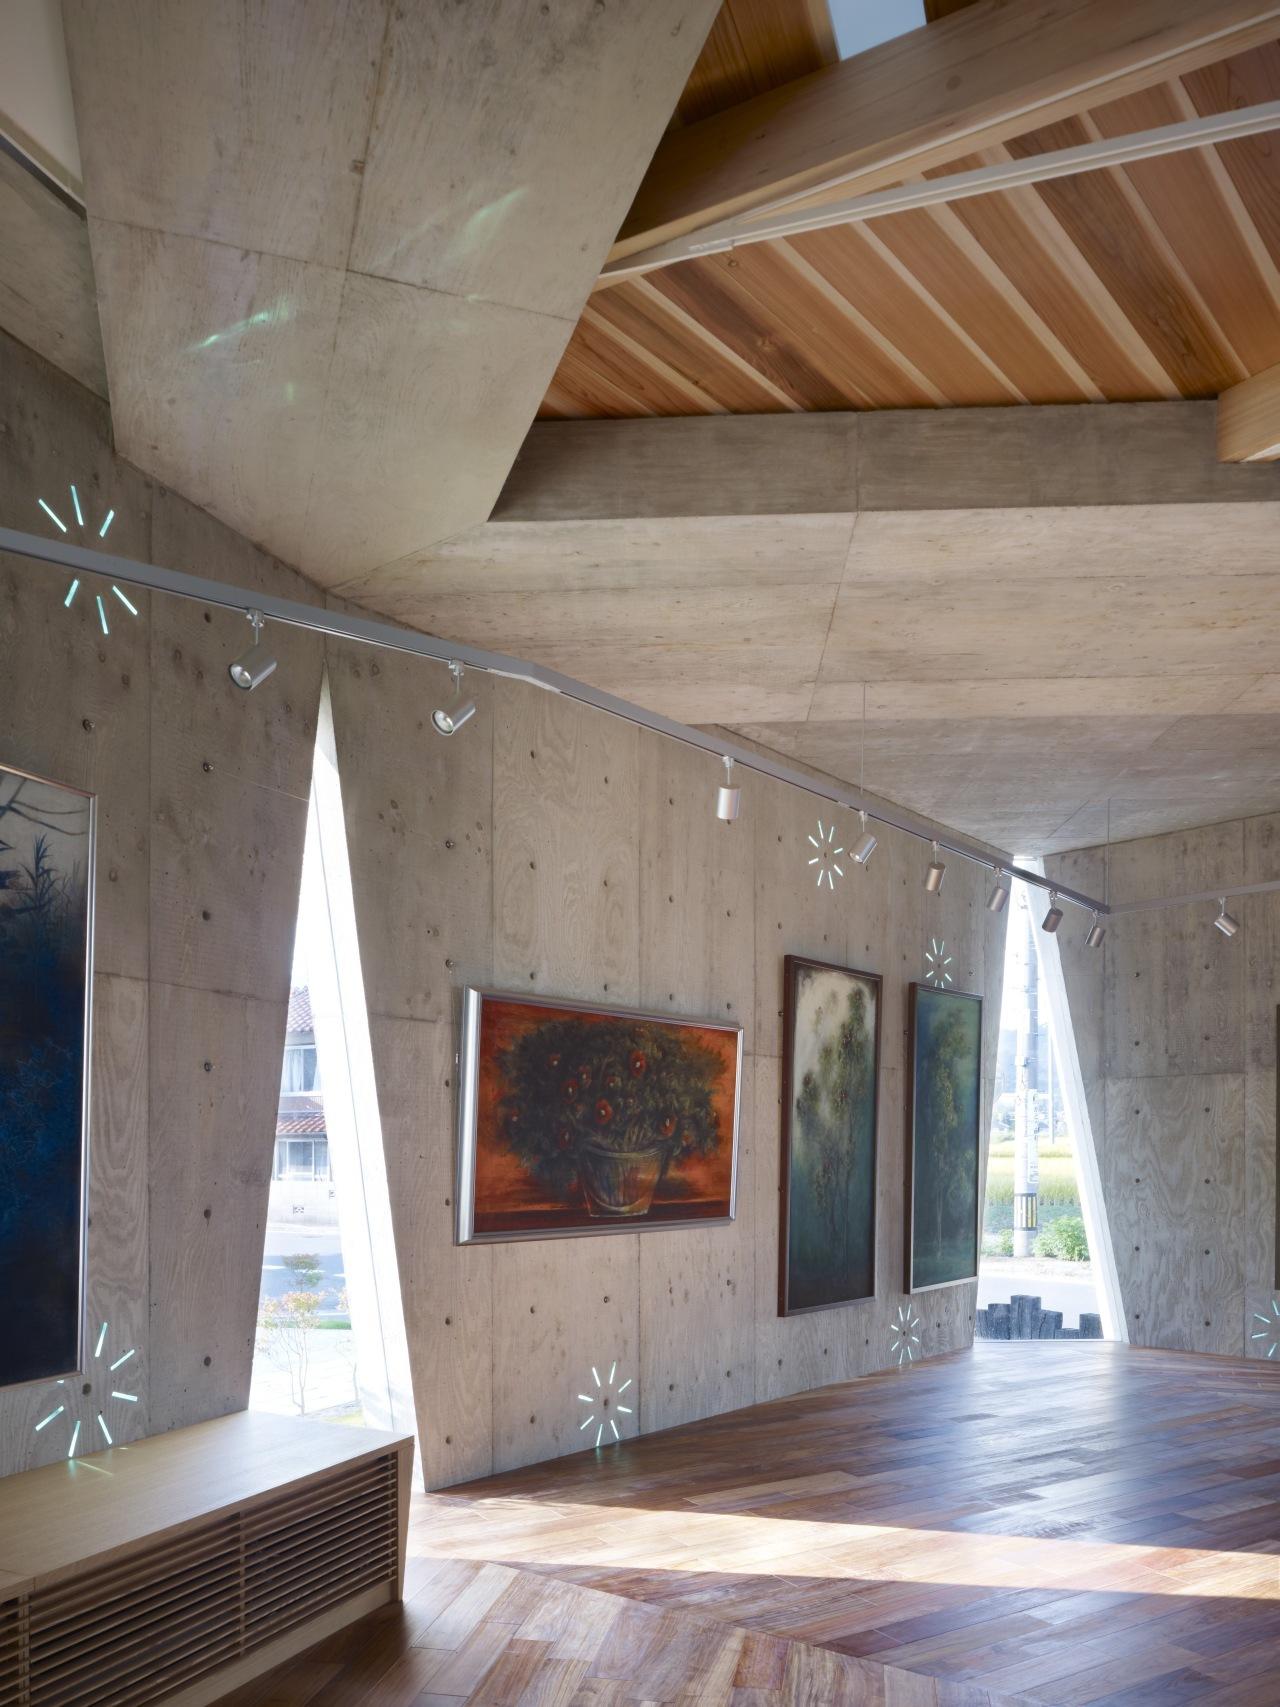 D Art Exhibition Ipoh : Galeria de museu arte mecenat naf architect design